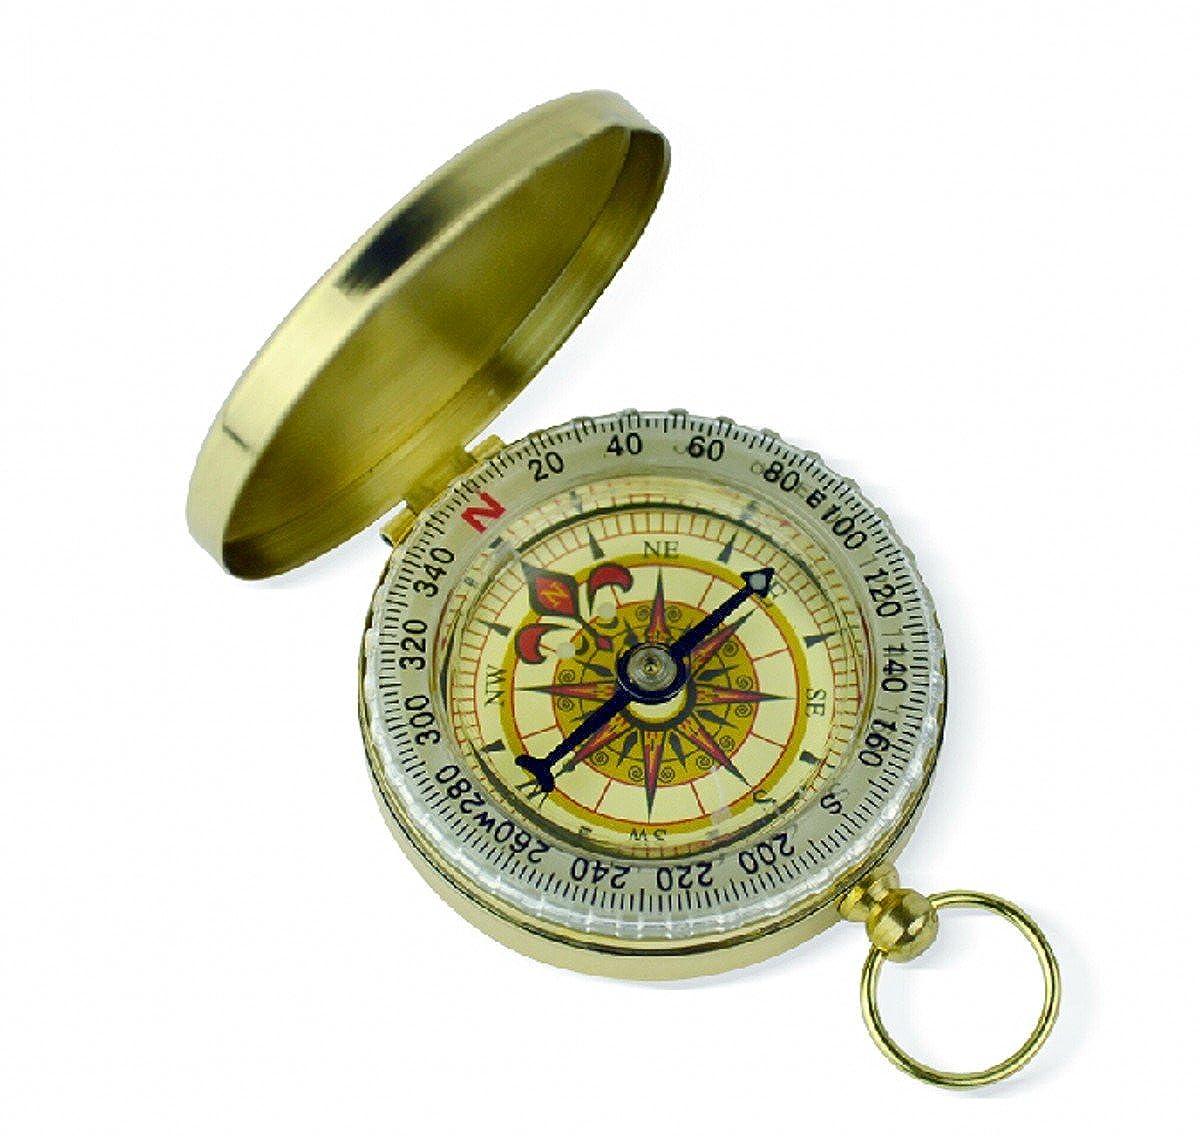 1 Piece Antique steampunk nautical pendant Retro vintage Luminous compass gift for men CYD